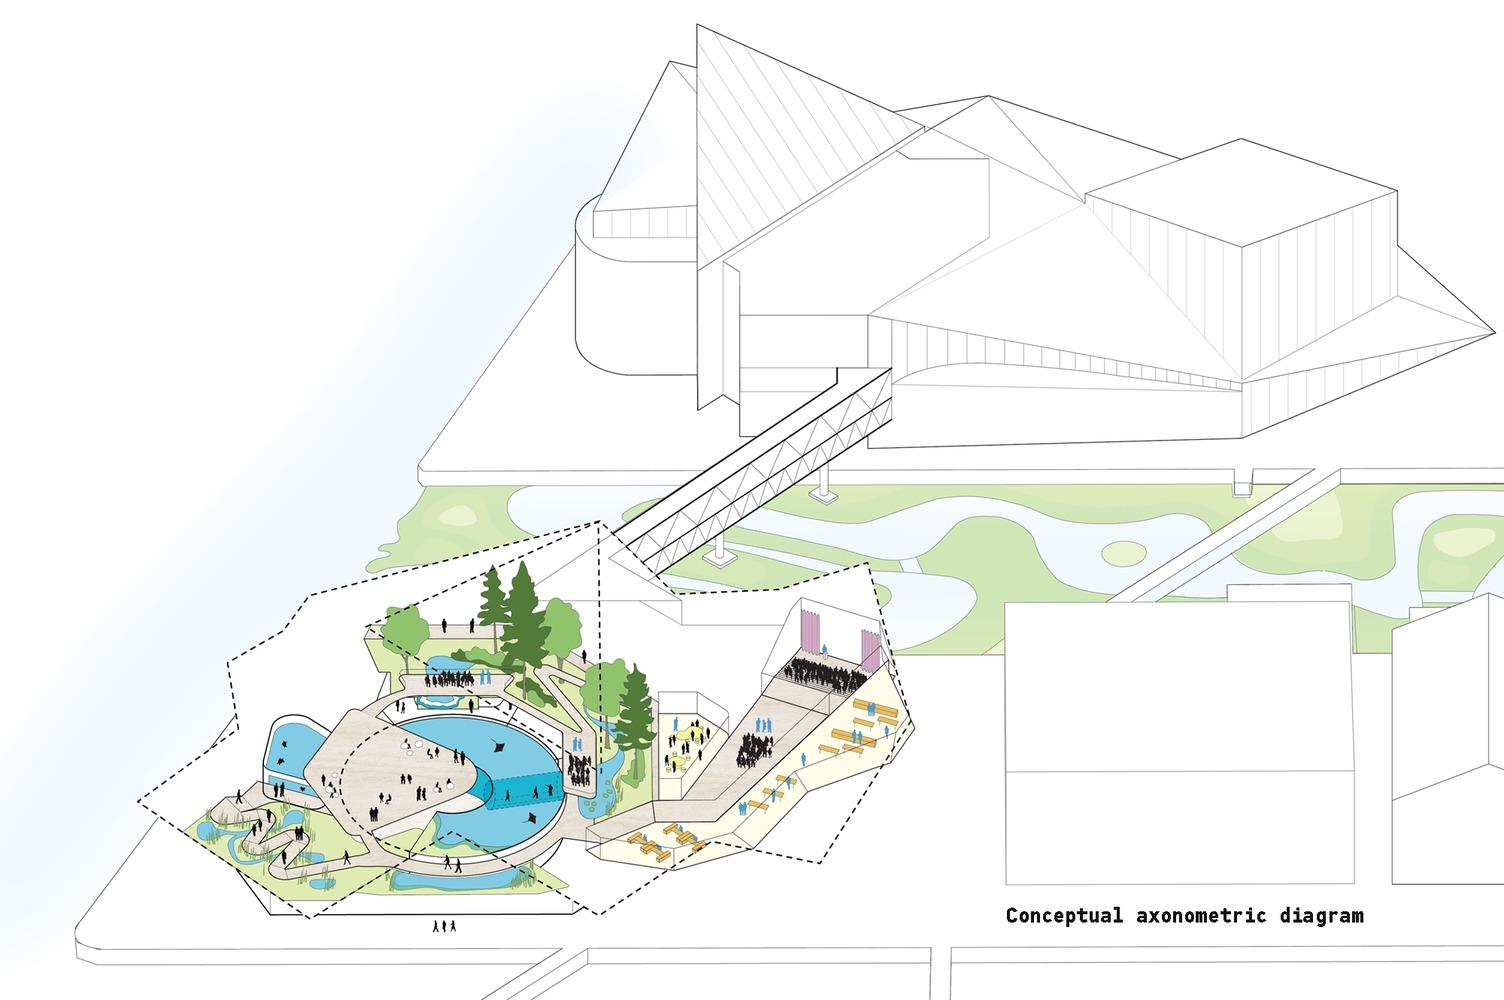 studio gang designs the national aquarium of the future in baltimore [ 1504 x 1000 Pixel ]